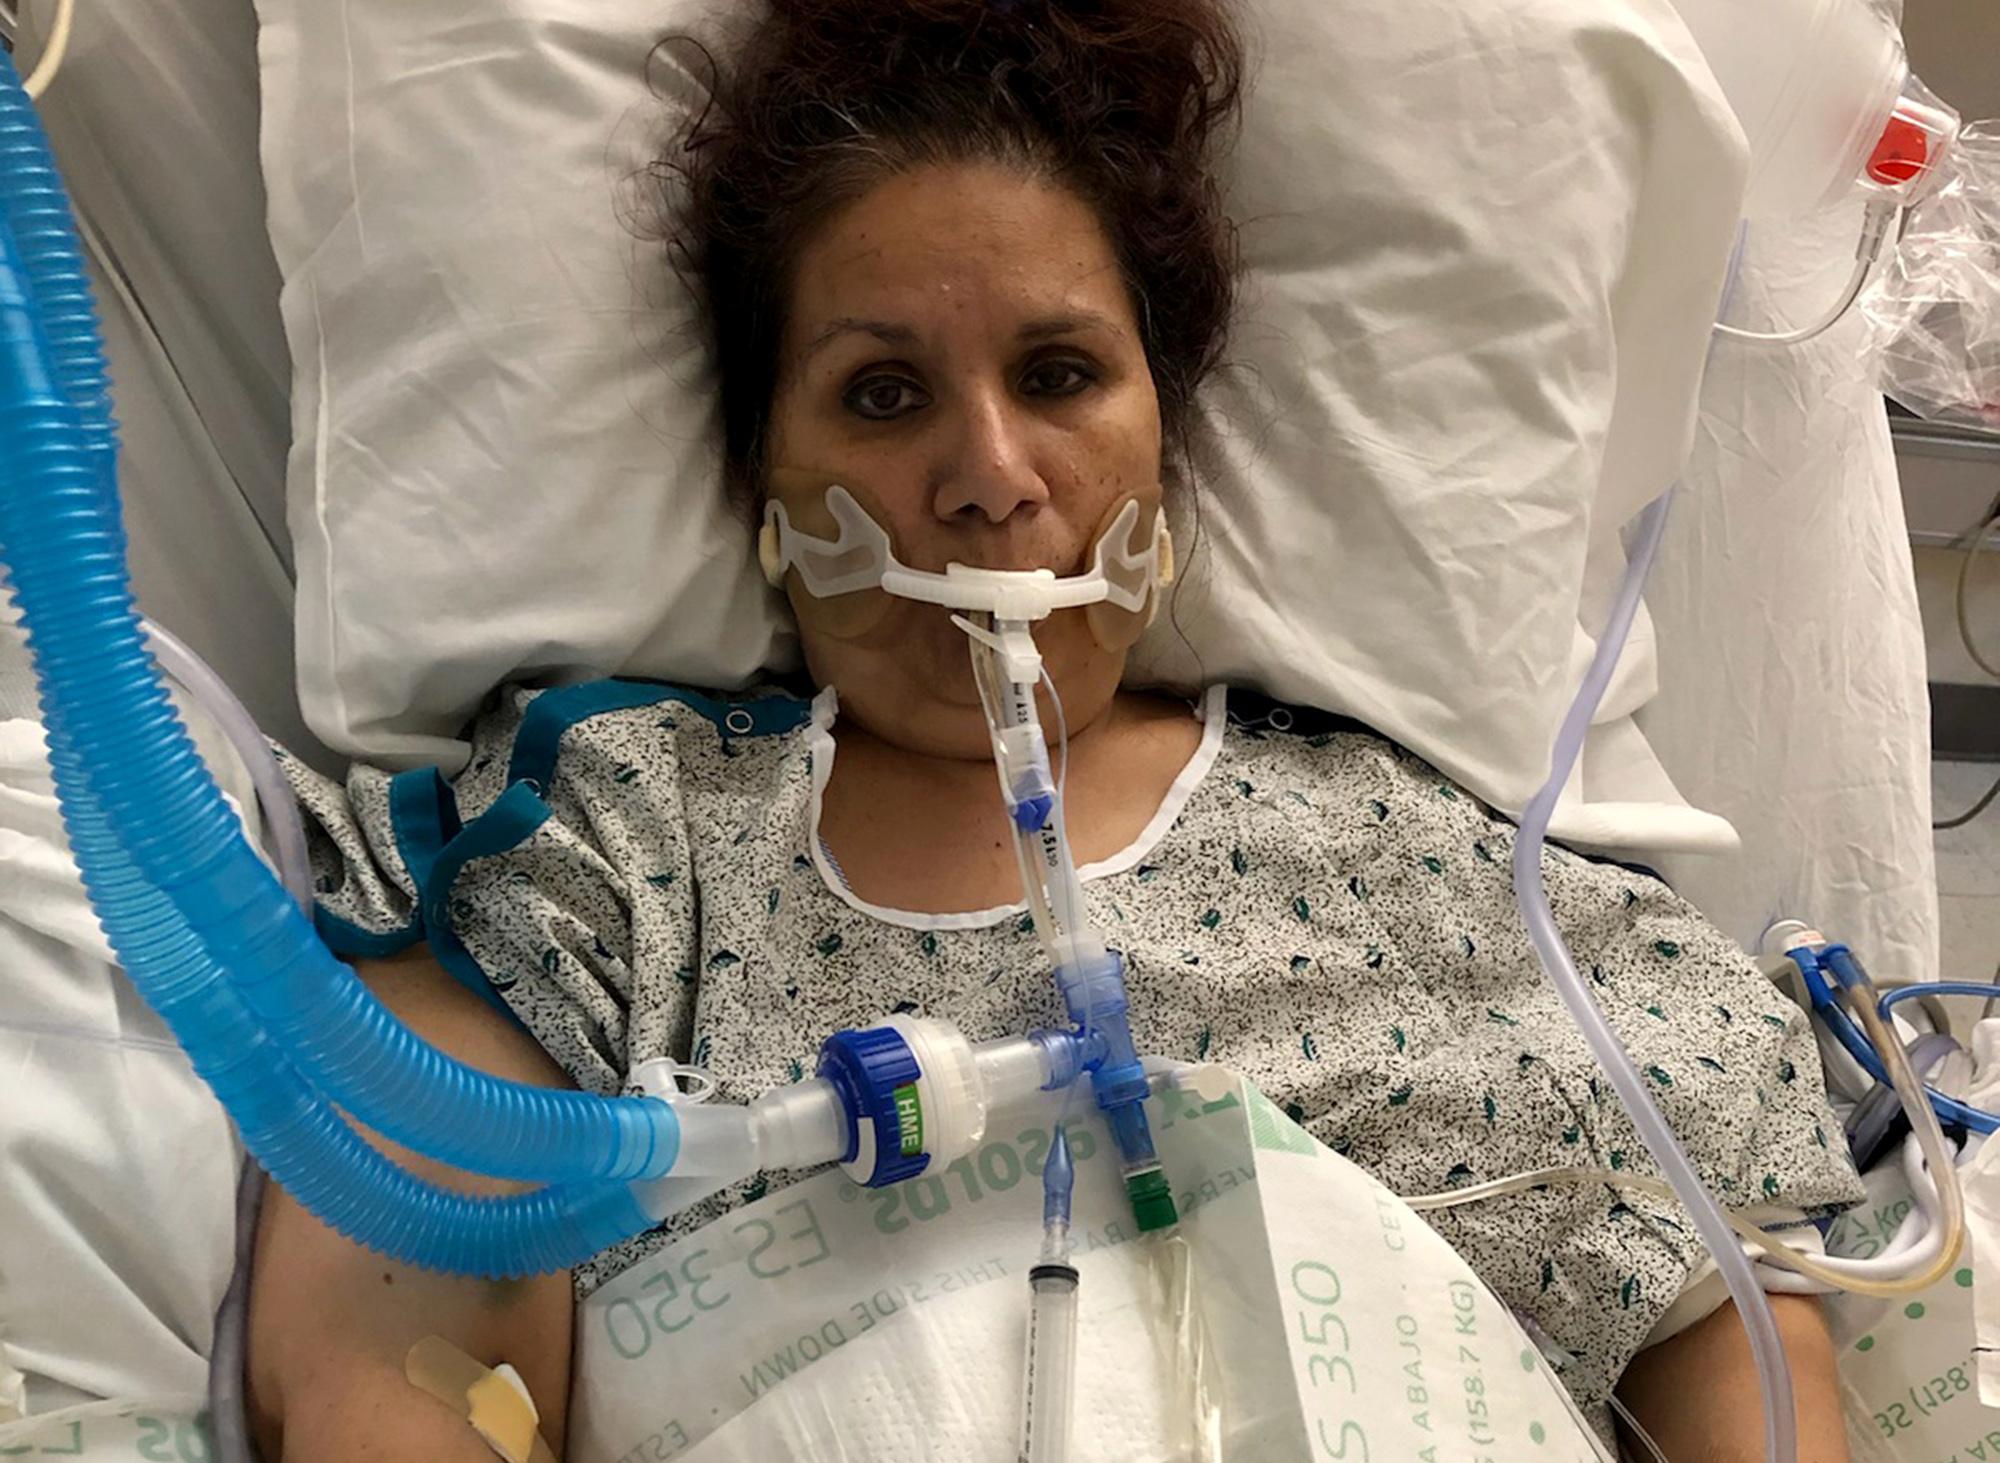 Coronavirus Ventilator Survivors Face Harsh Recovery After Virus